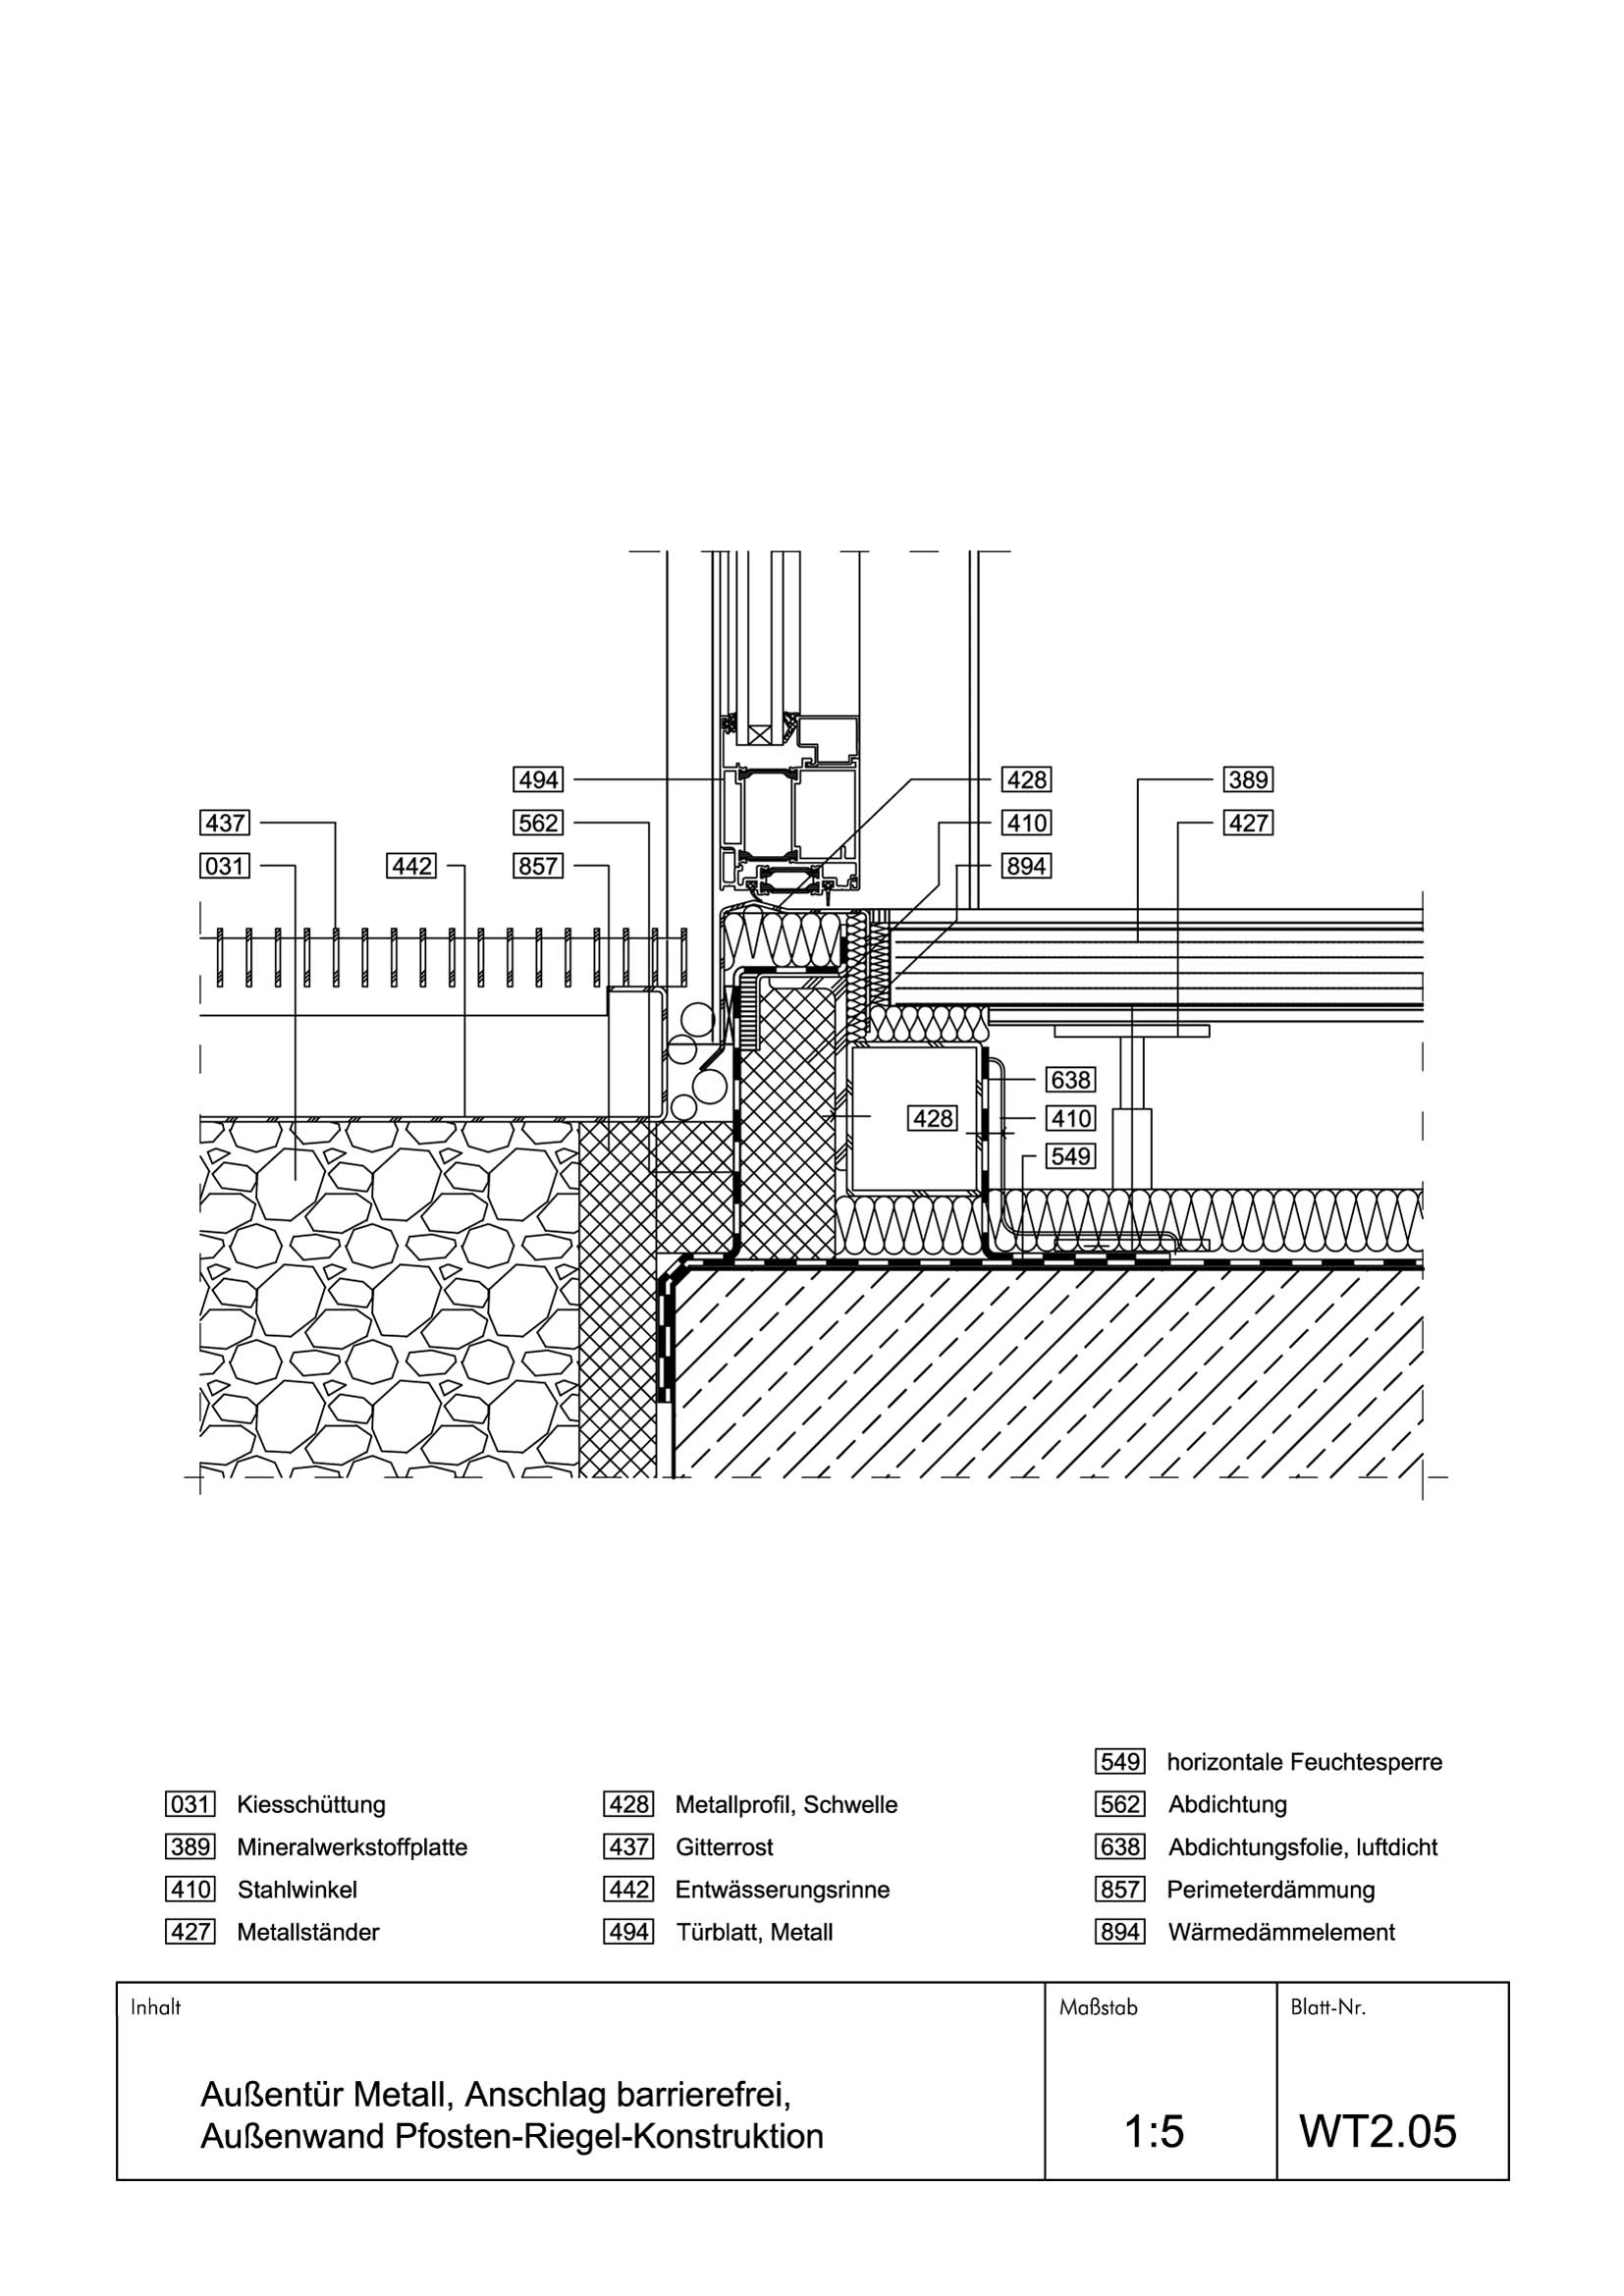 Haustüranschluss detail  Barrierefreies Bauen: Details - Barrierefrei planen & bauen